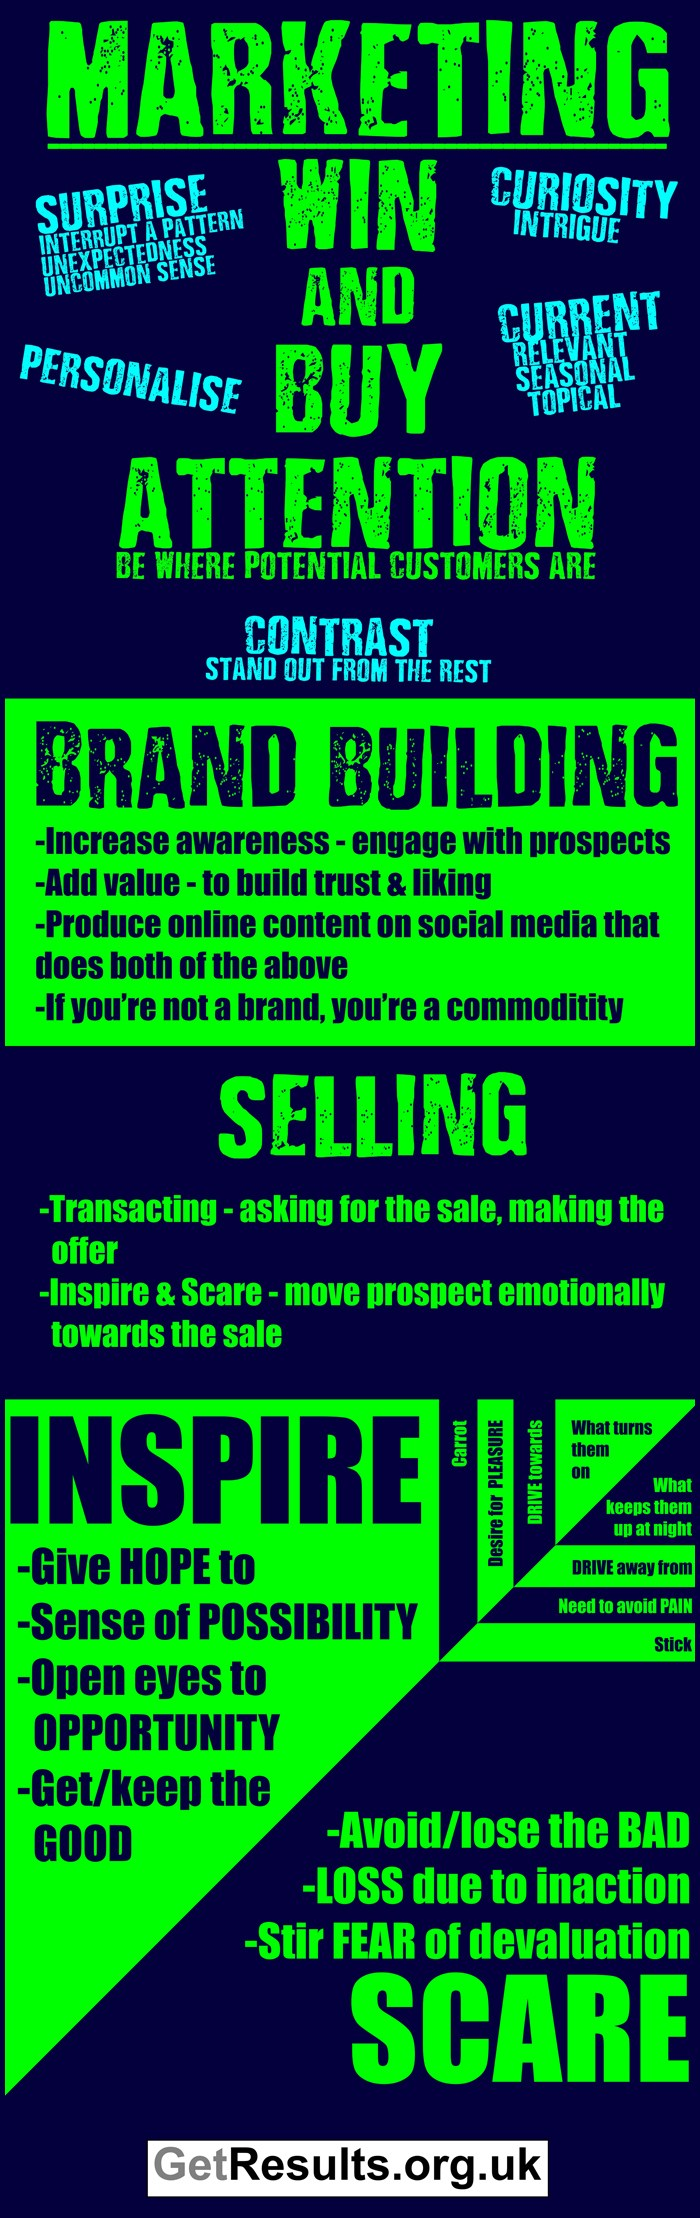 Get Results: marketing illustration